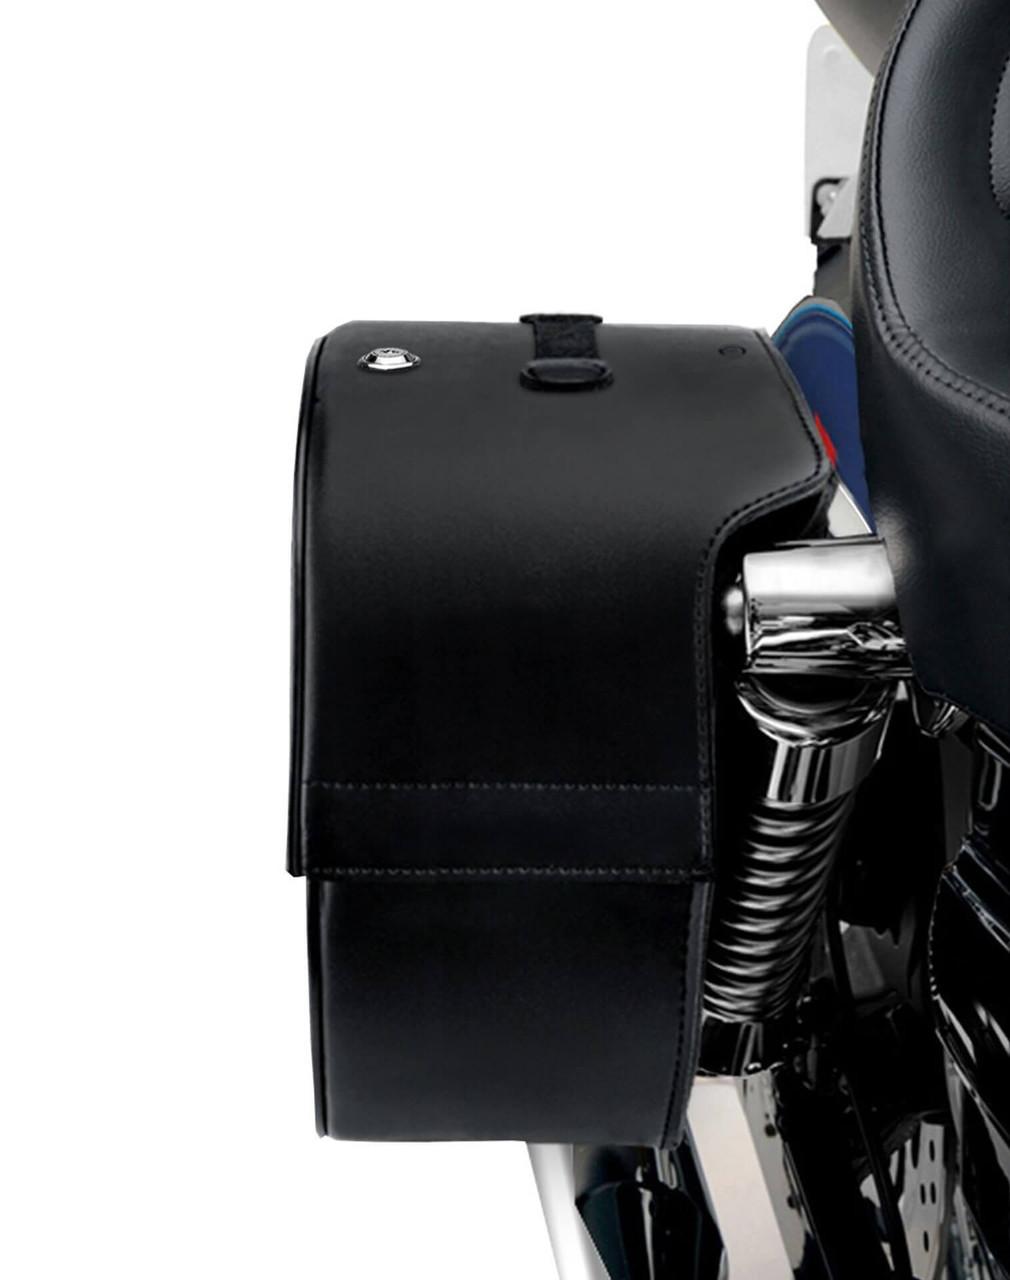 Honda VTX 1300 C Shock Cutout Studded Motorcycle Saddlebags Shock Cutout View